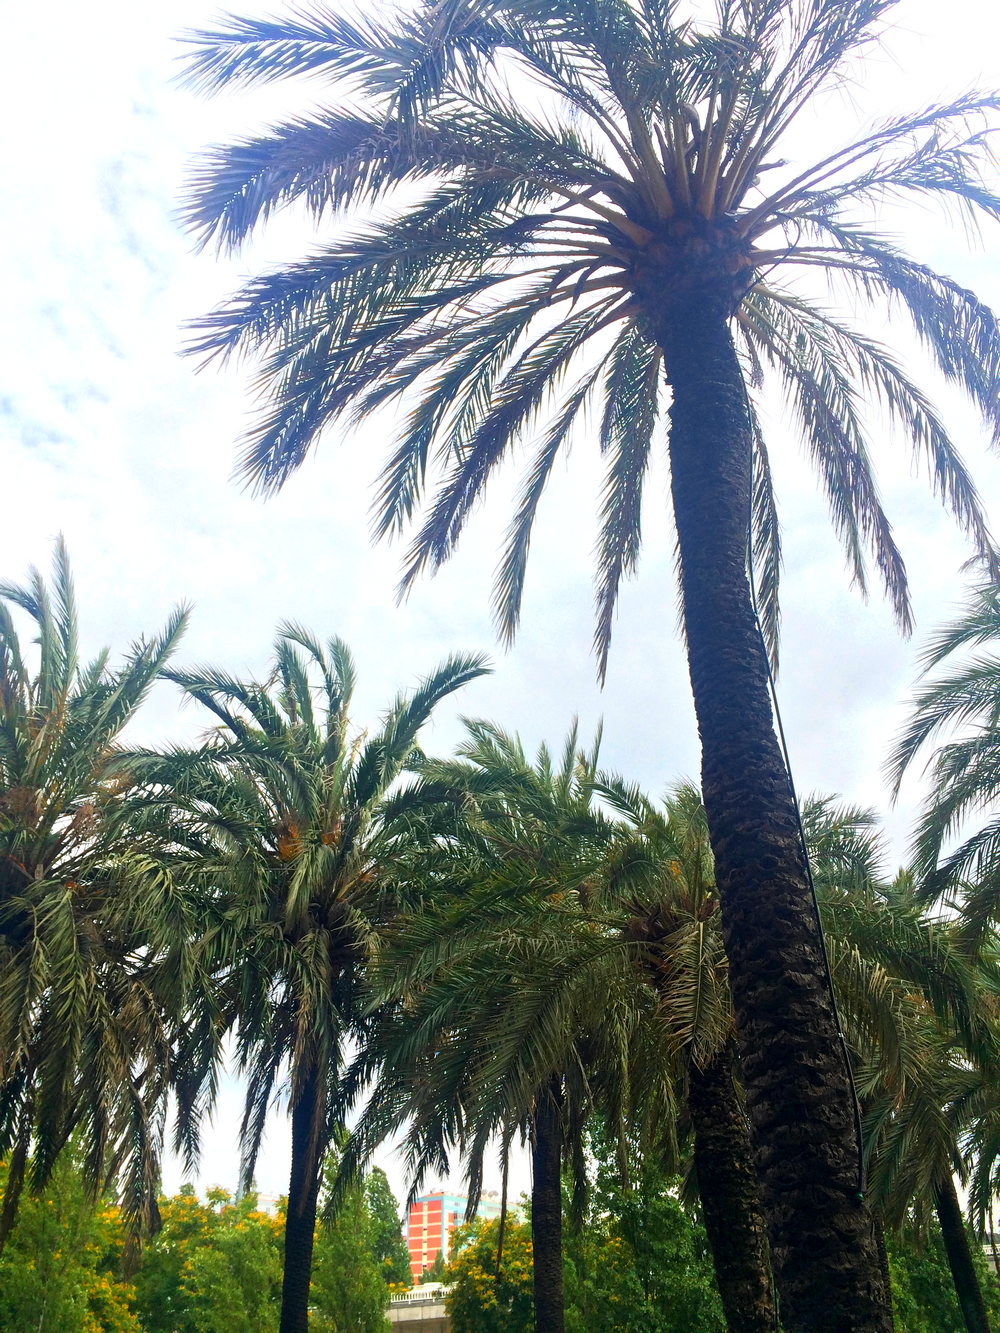 1. Palmtrees lisbon Copyright mandy victoria